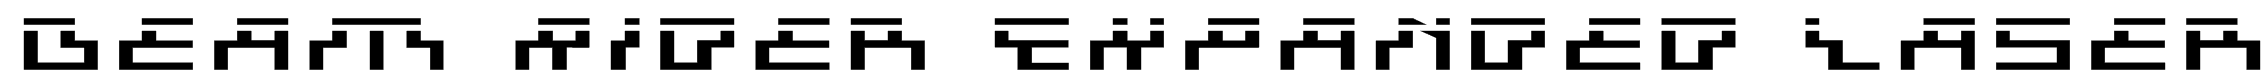 Beam Rider Expanded Laser Font